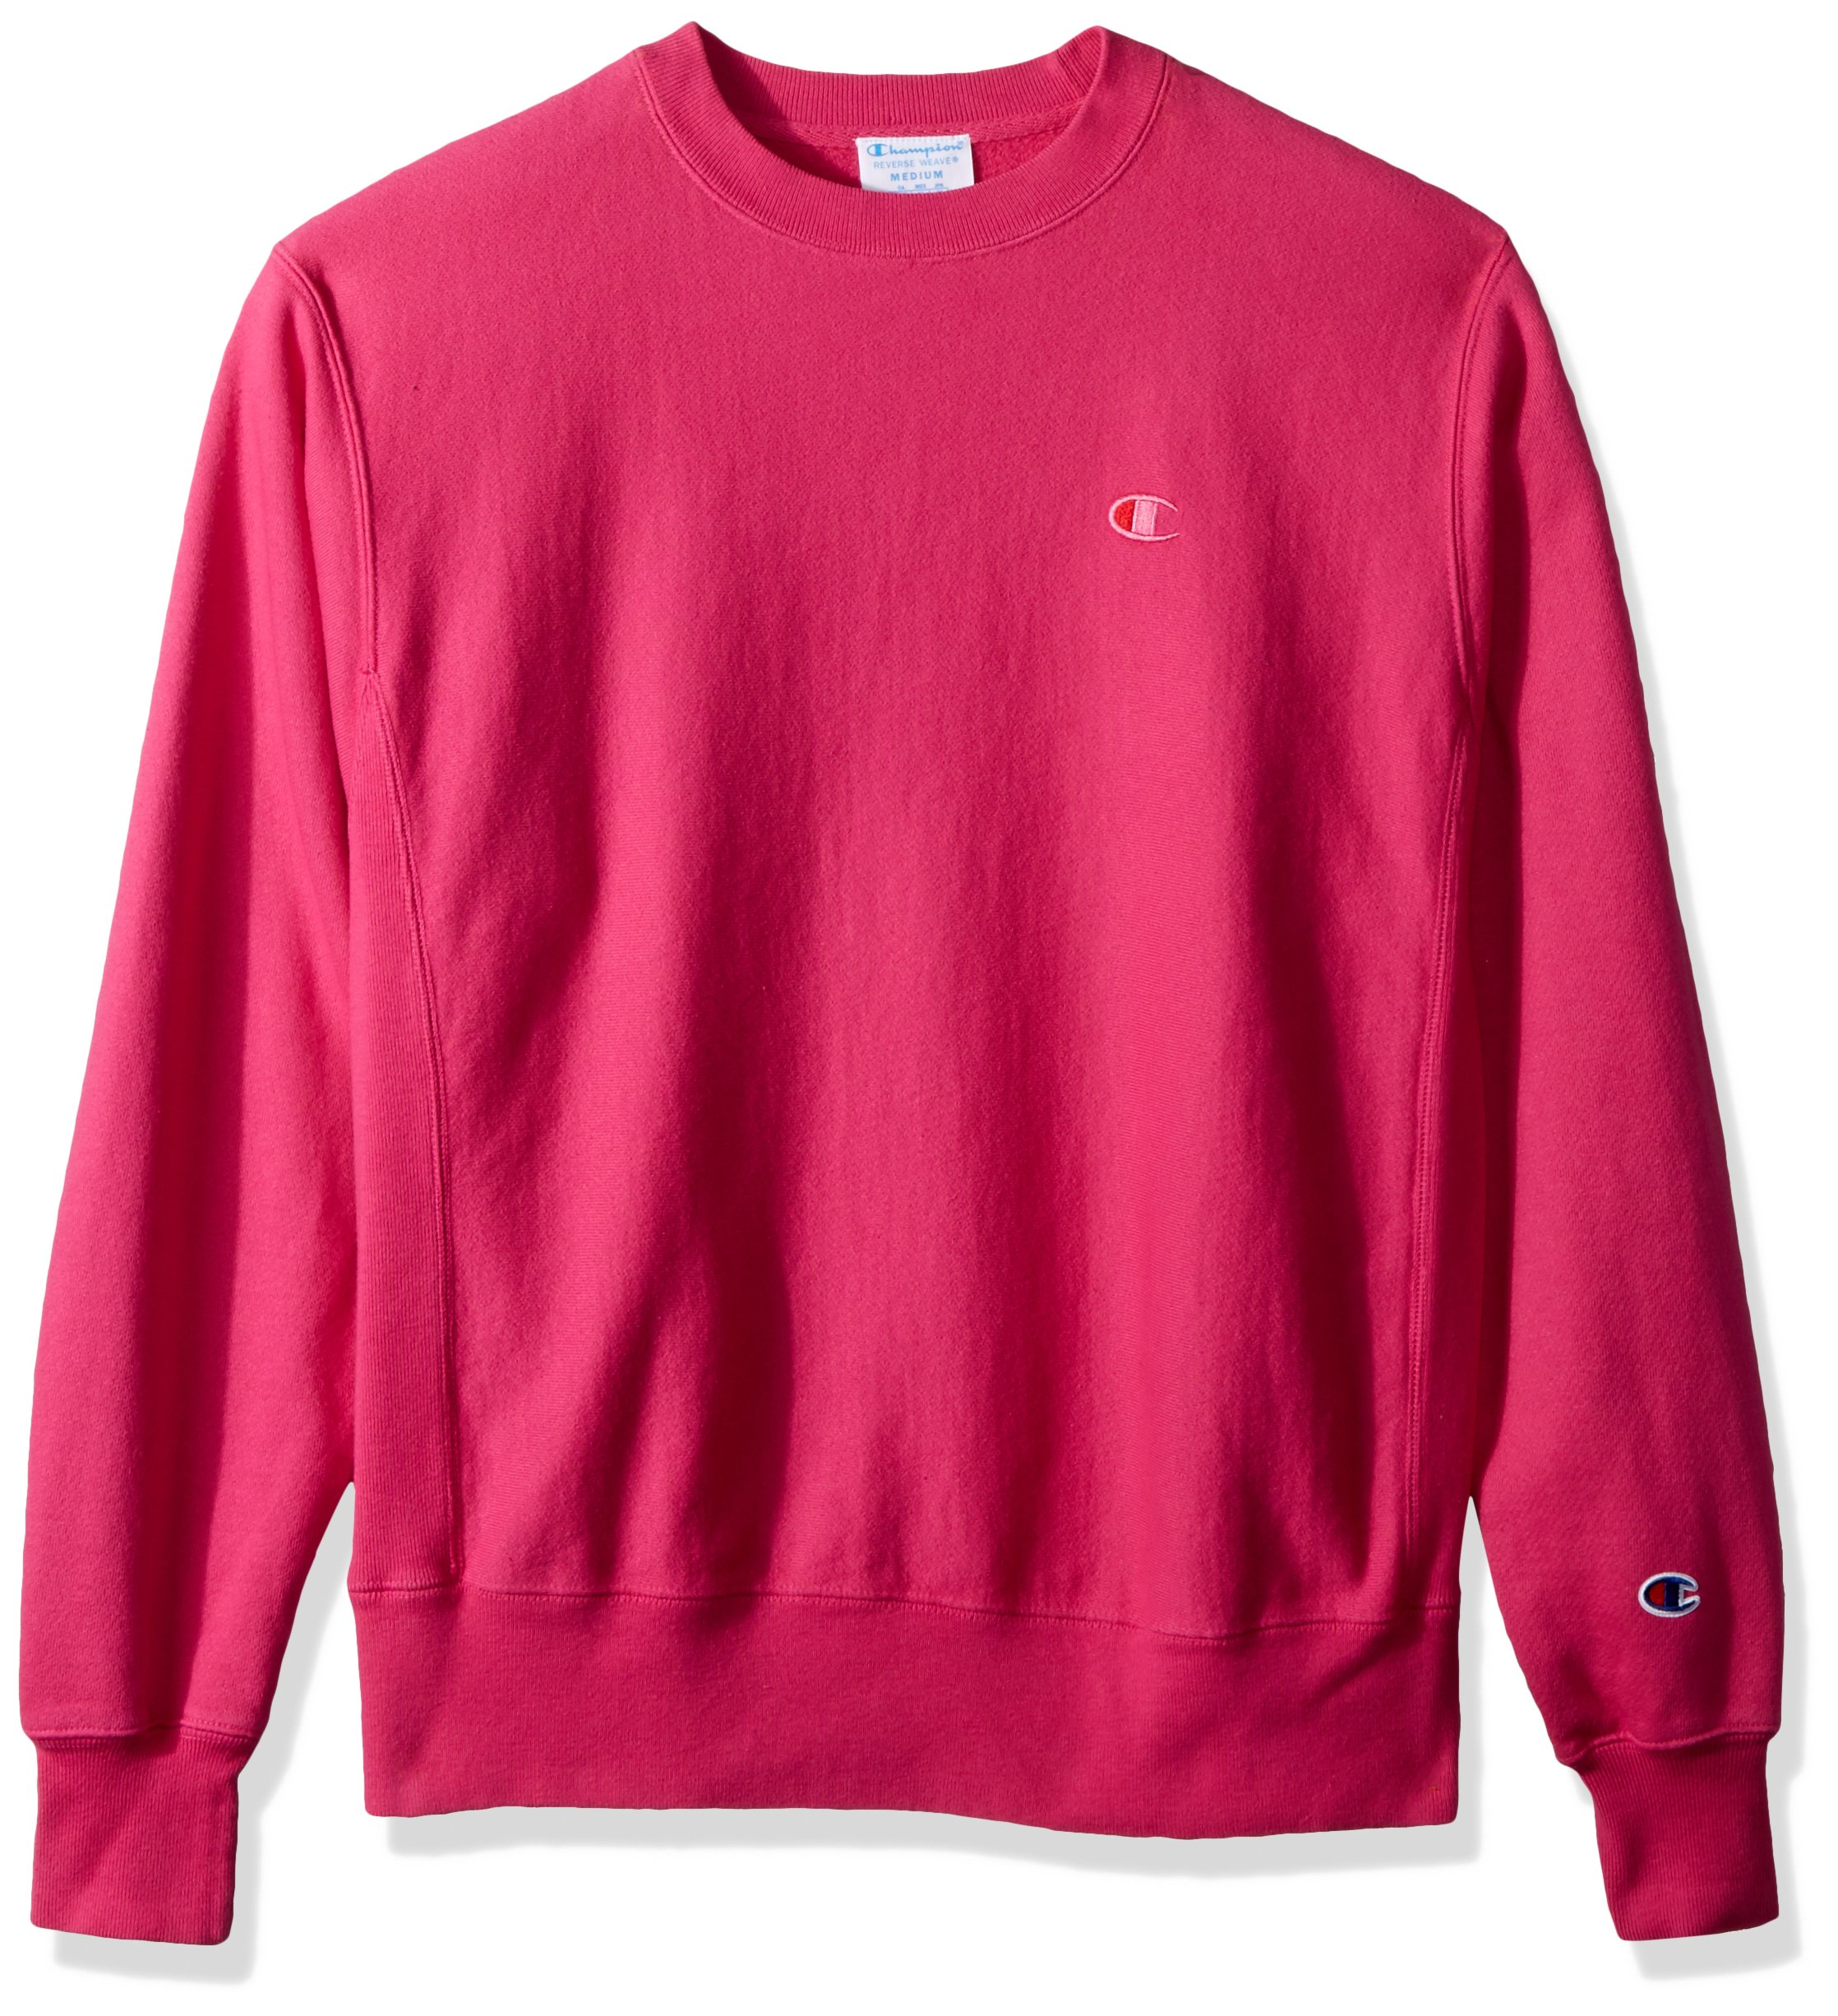 Champion LIFE Men's Reverse Weave Sweatshirt, Amaranth Pigment Dyed, S